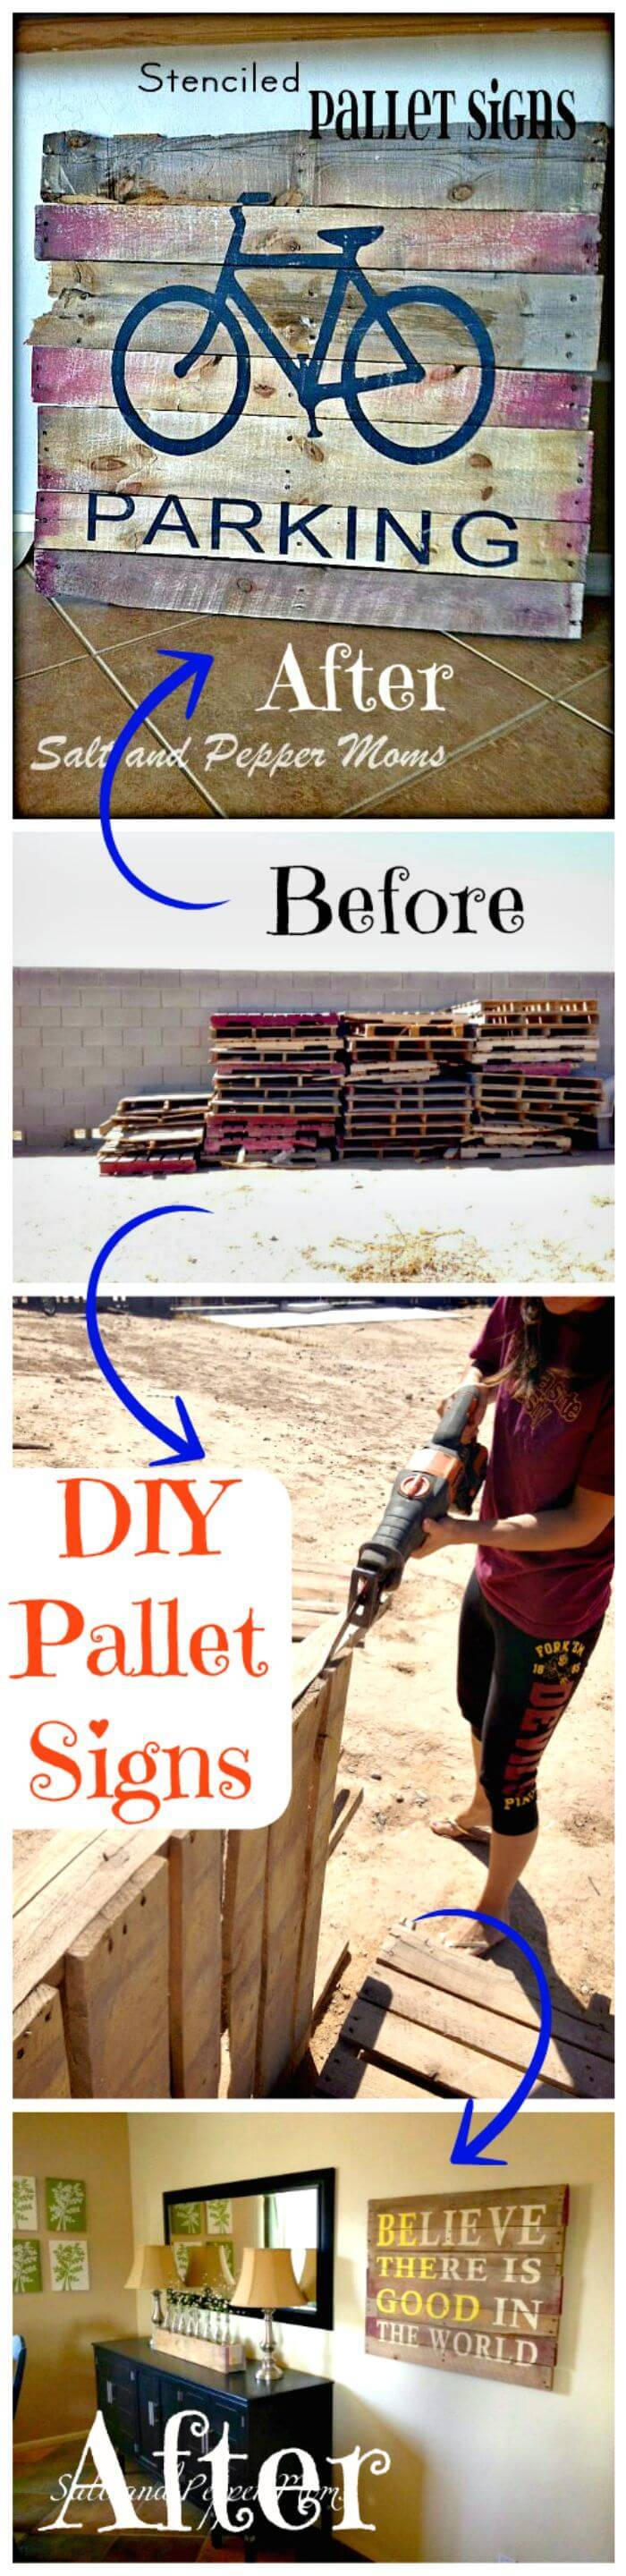 DIY Pallet Signs